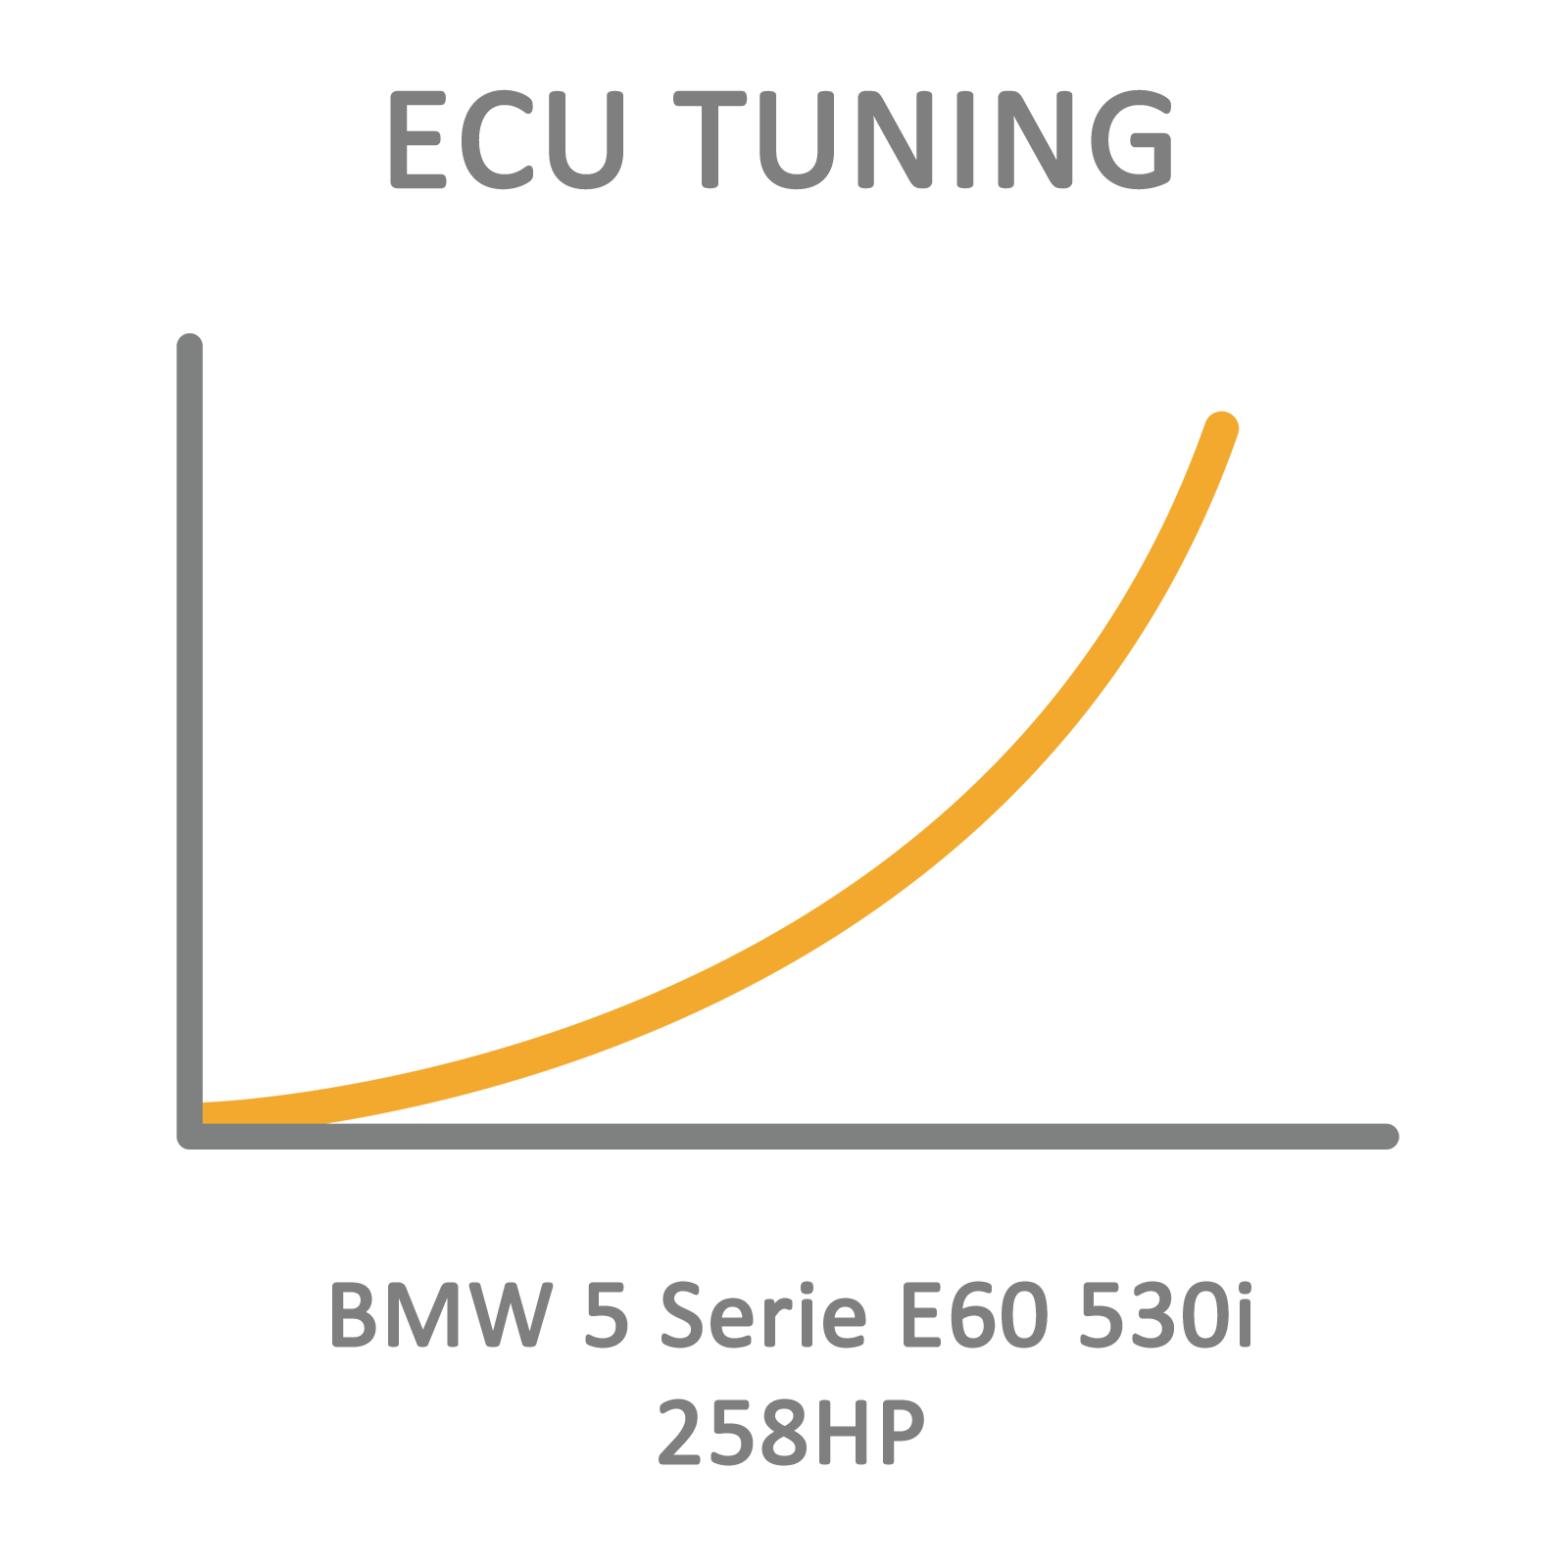 BMW 5 Series E60 530i 258HP ECU Tuning Remapping Programming